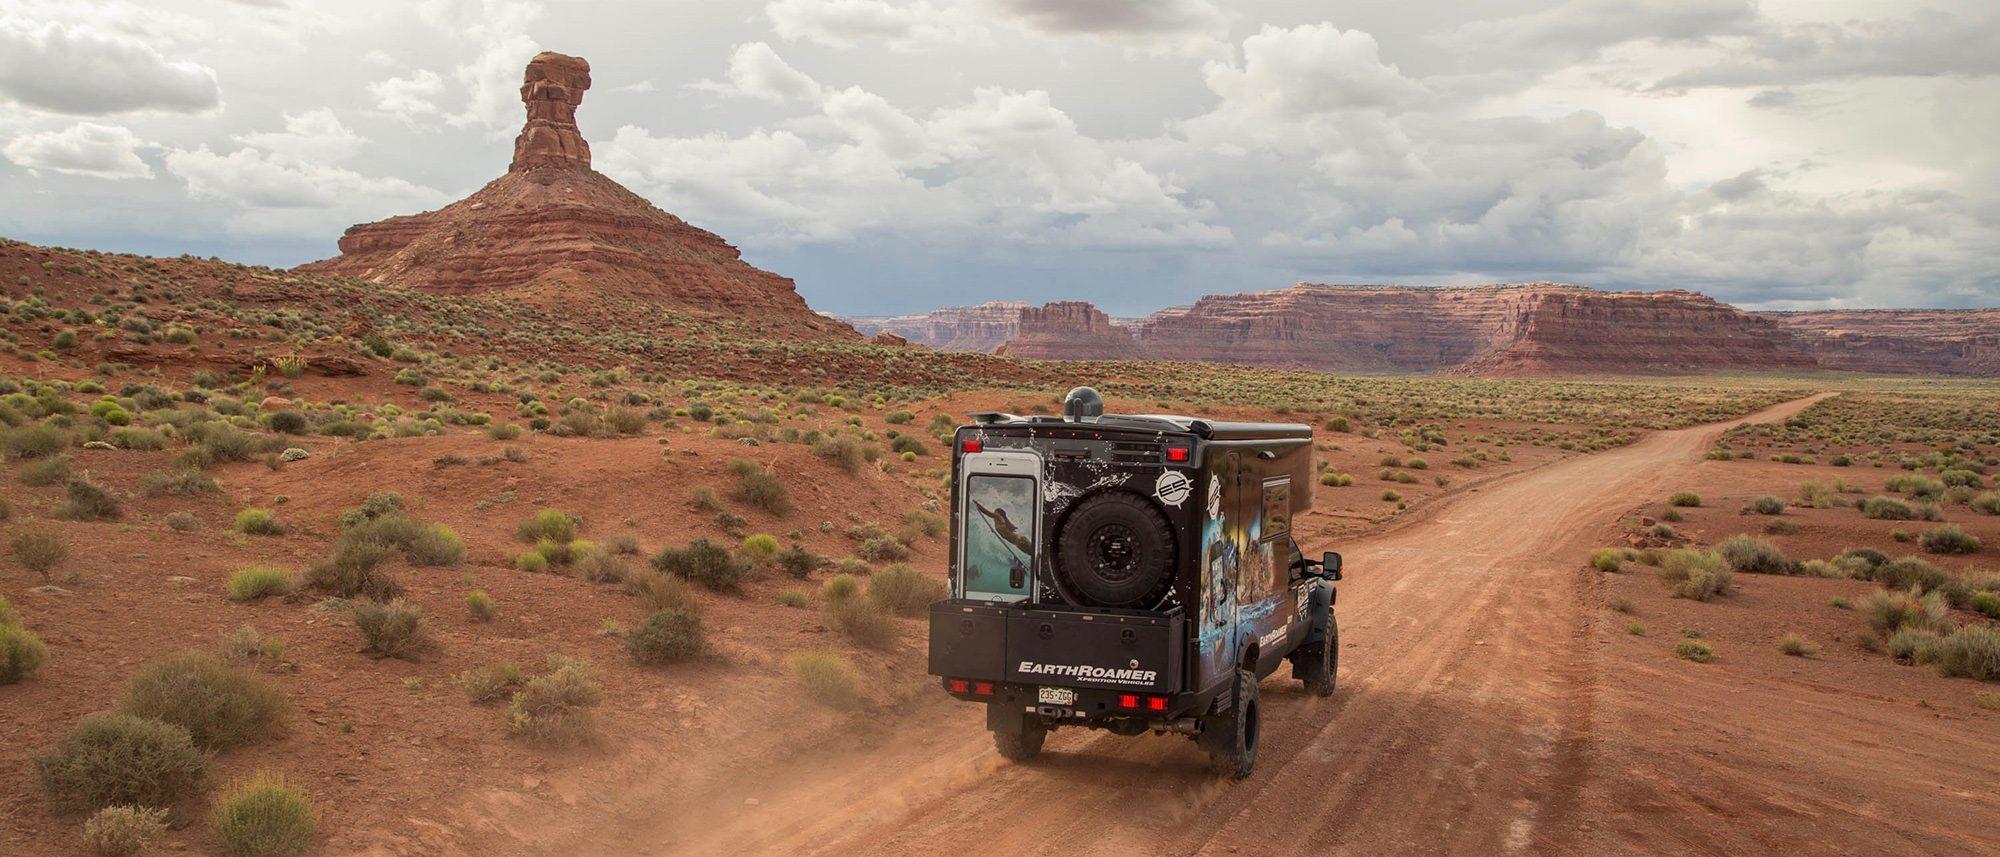 Ford EarthRoamer - off road